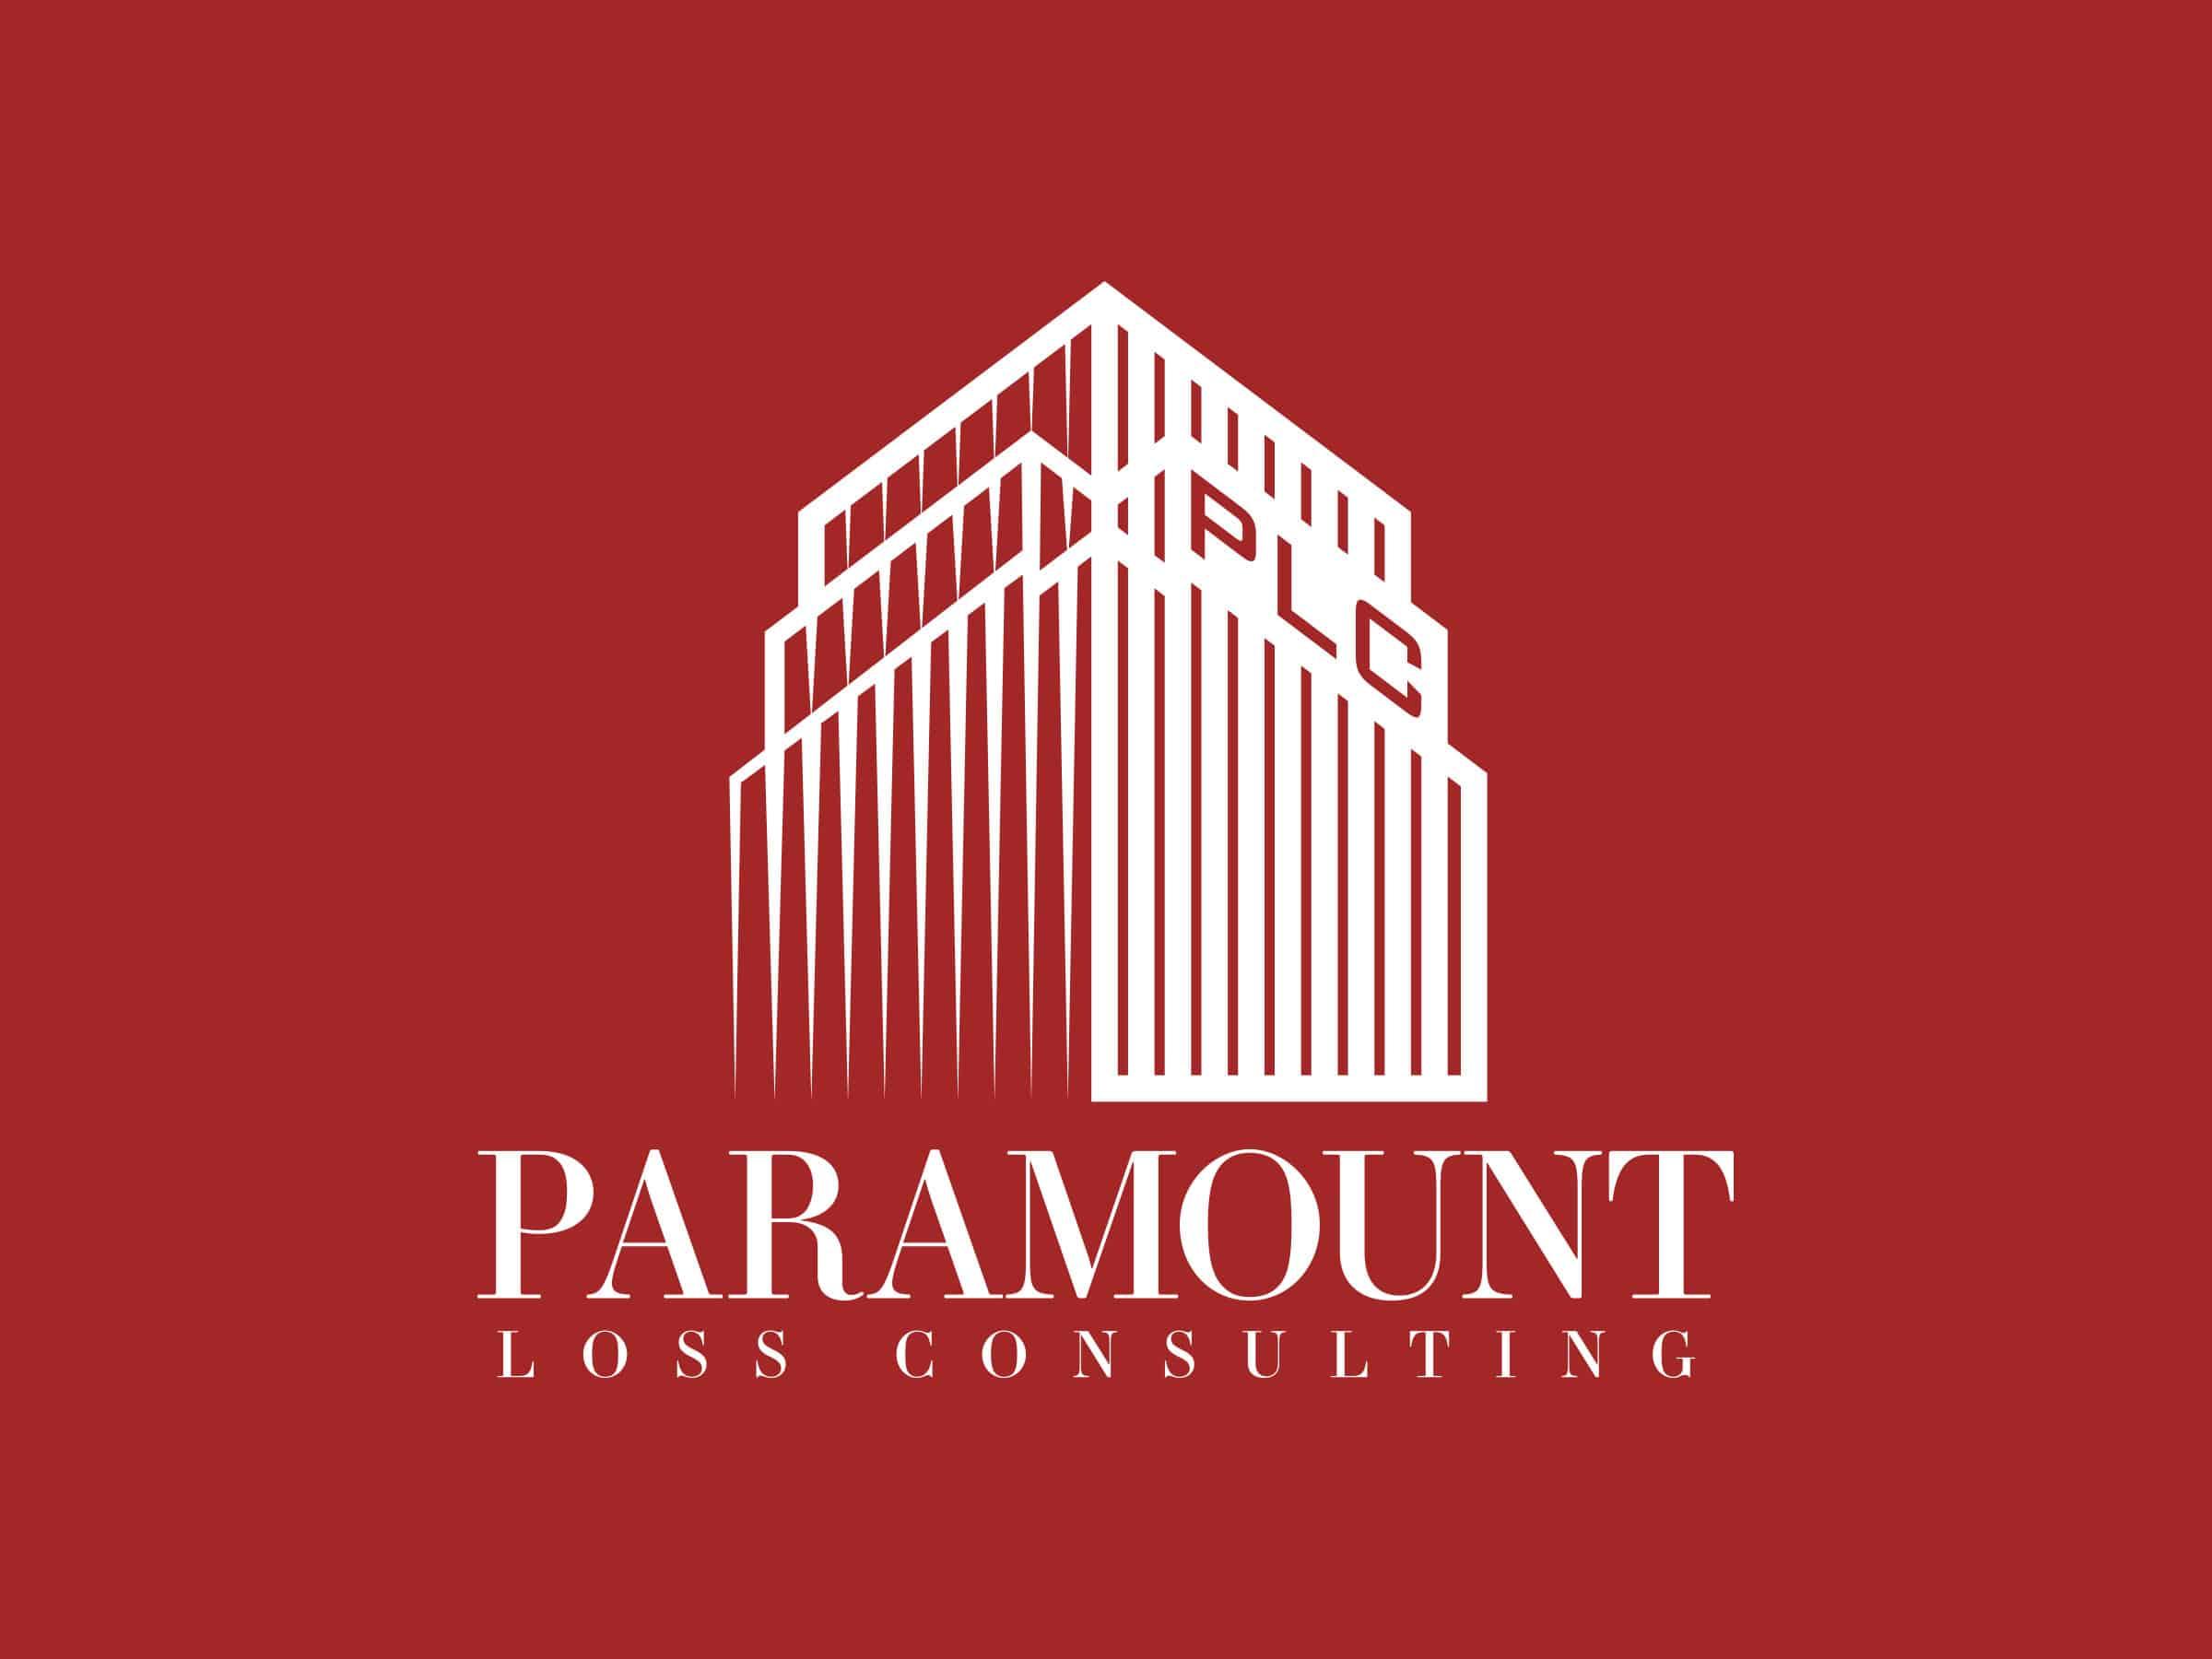 paramount loss consulting logo